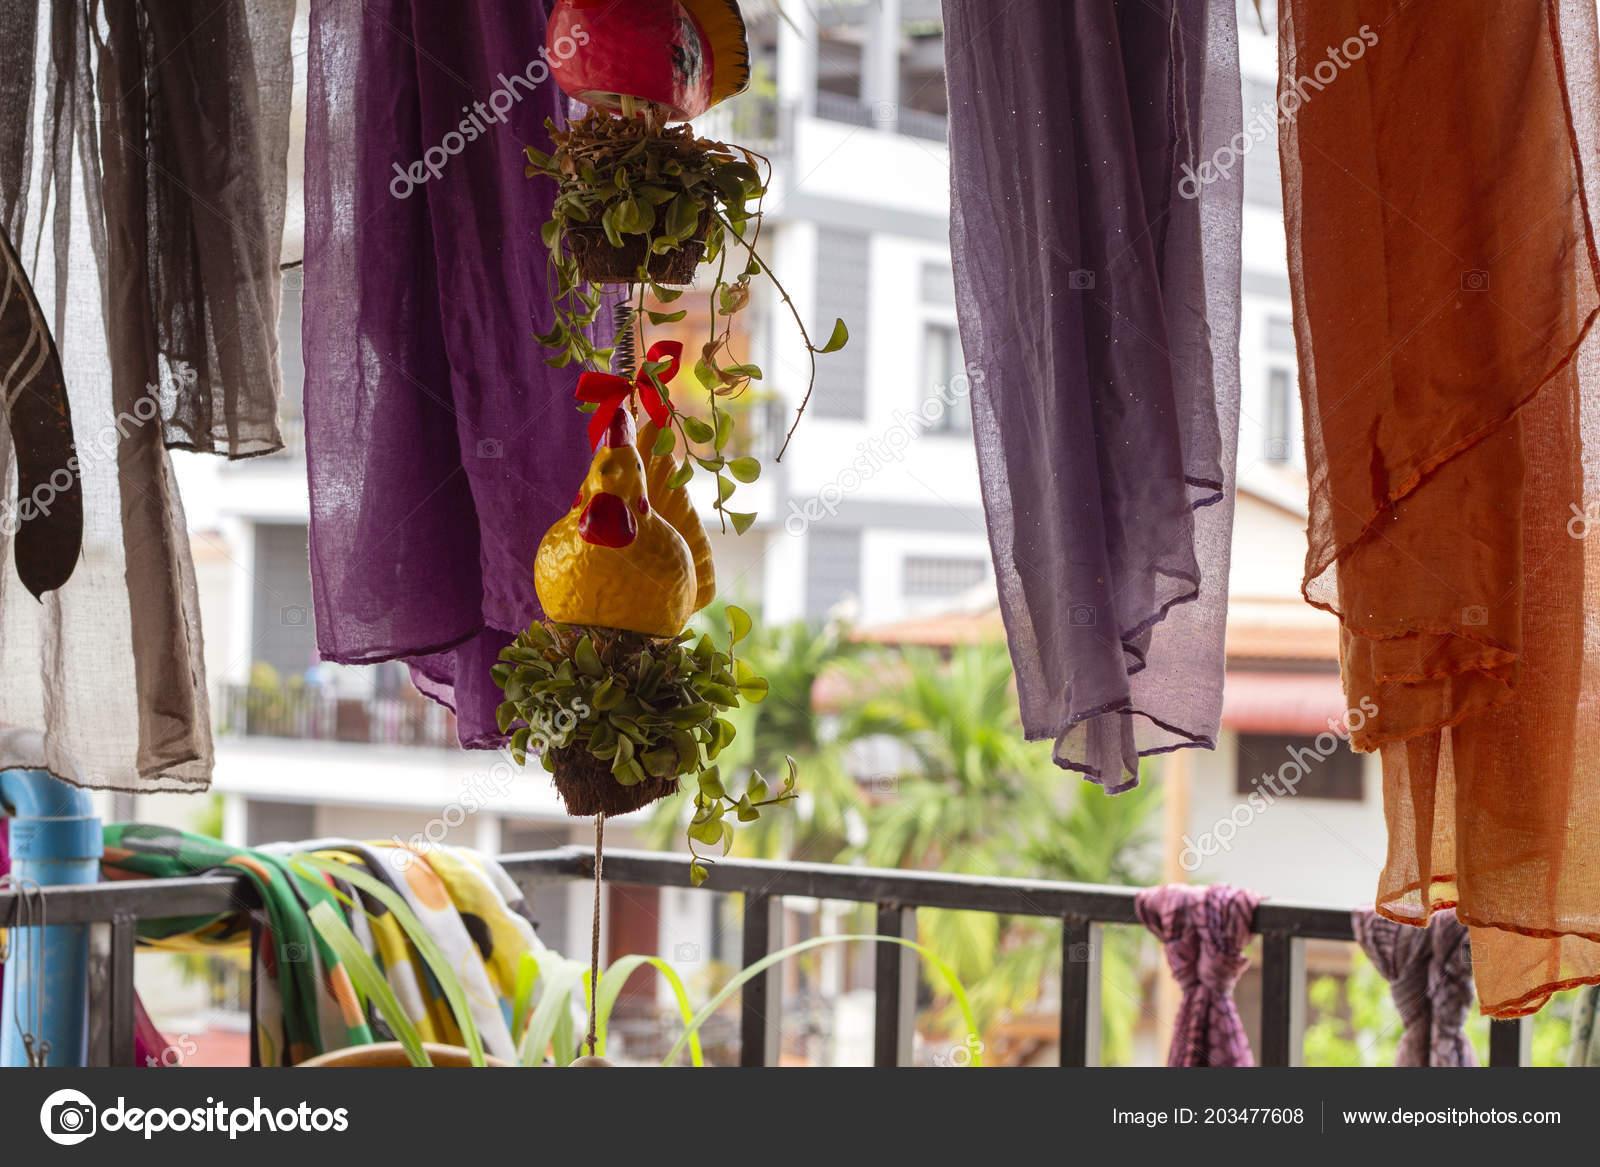 Open Terrace Restaurant Decor Chicken Toy Silk Curtains Summer Veranda Stock Photo C Davdeka 203477608